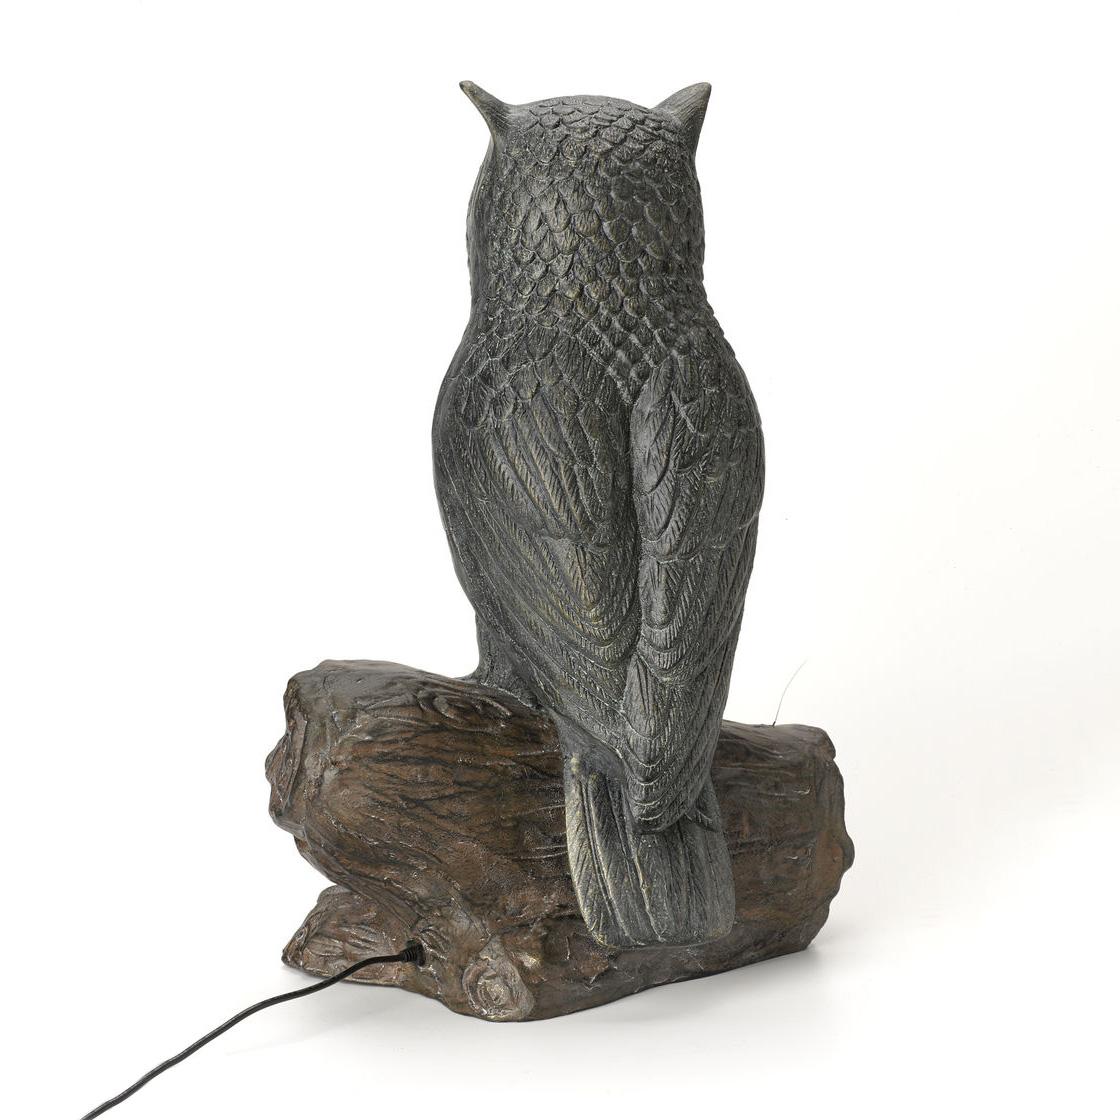 Owl Outdoor Bluetooth Speaker Thegreenhead Com